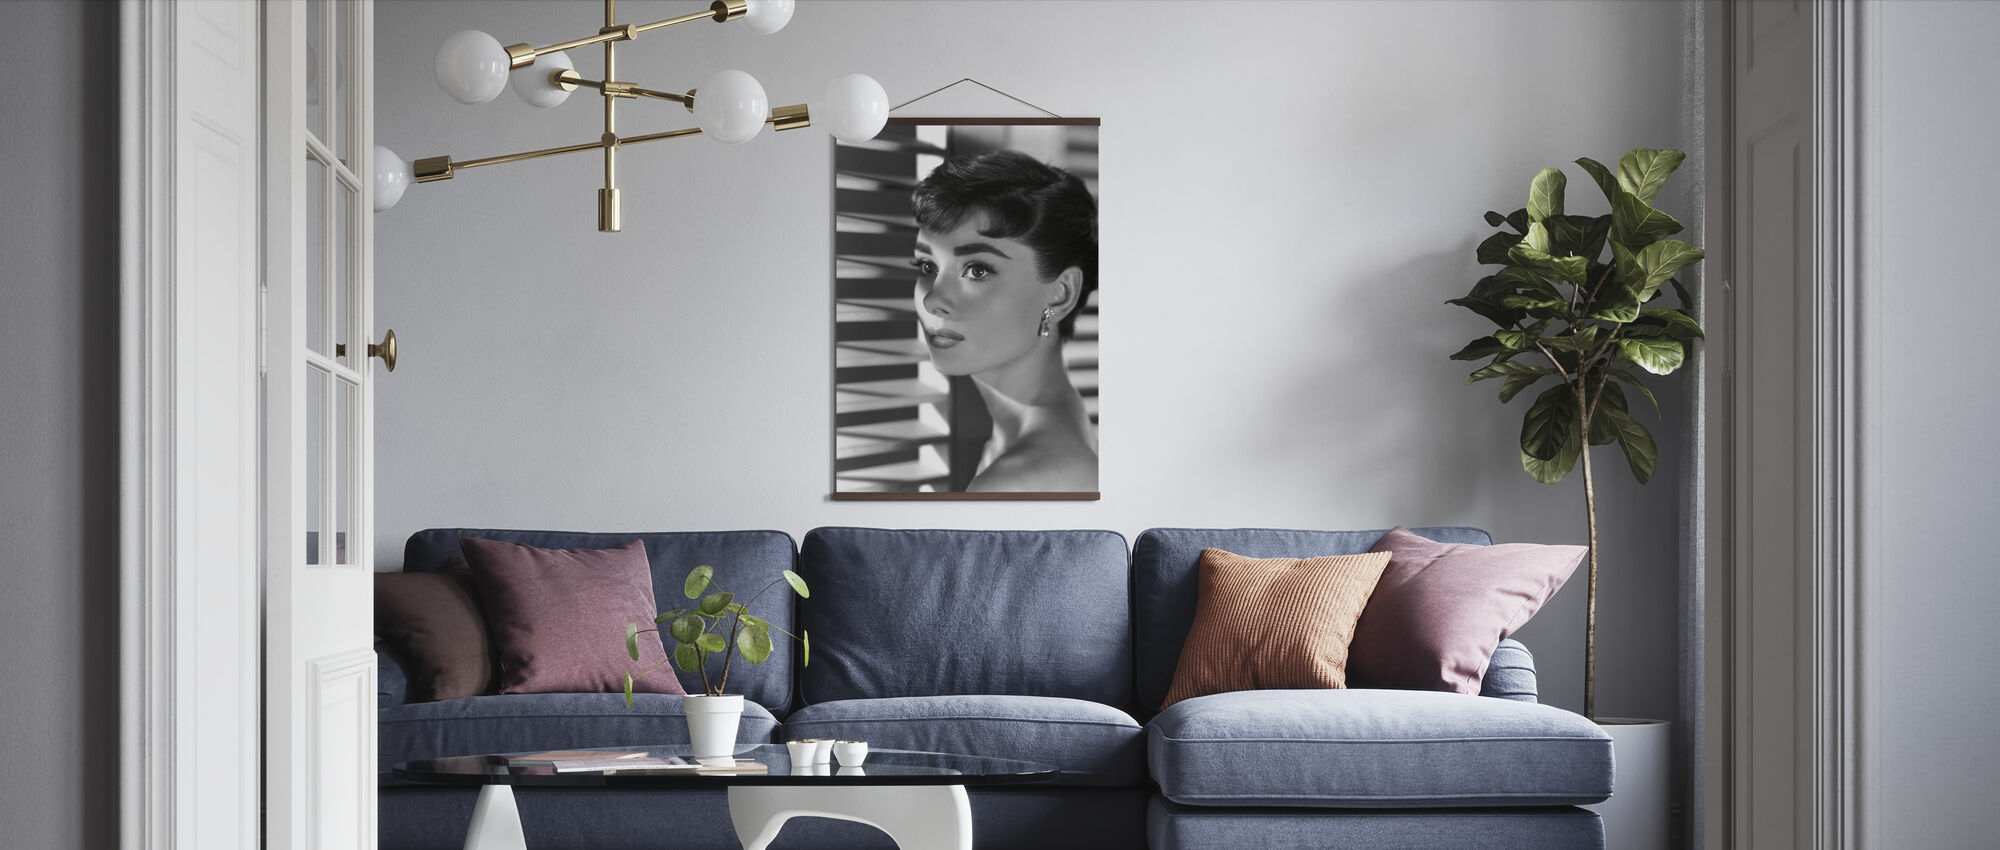 Audrey Hepburn in Sabrina - Poster - Living Room